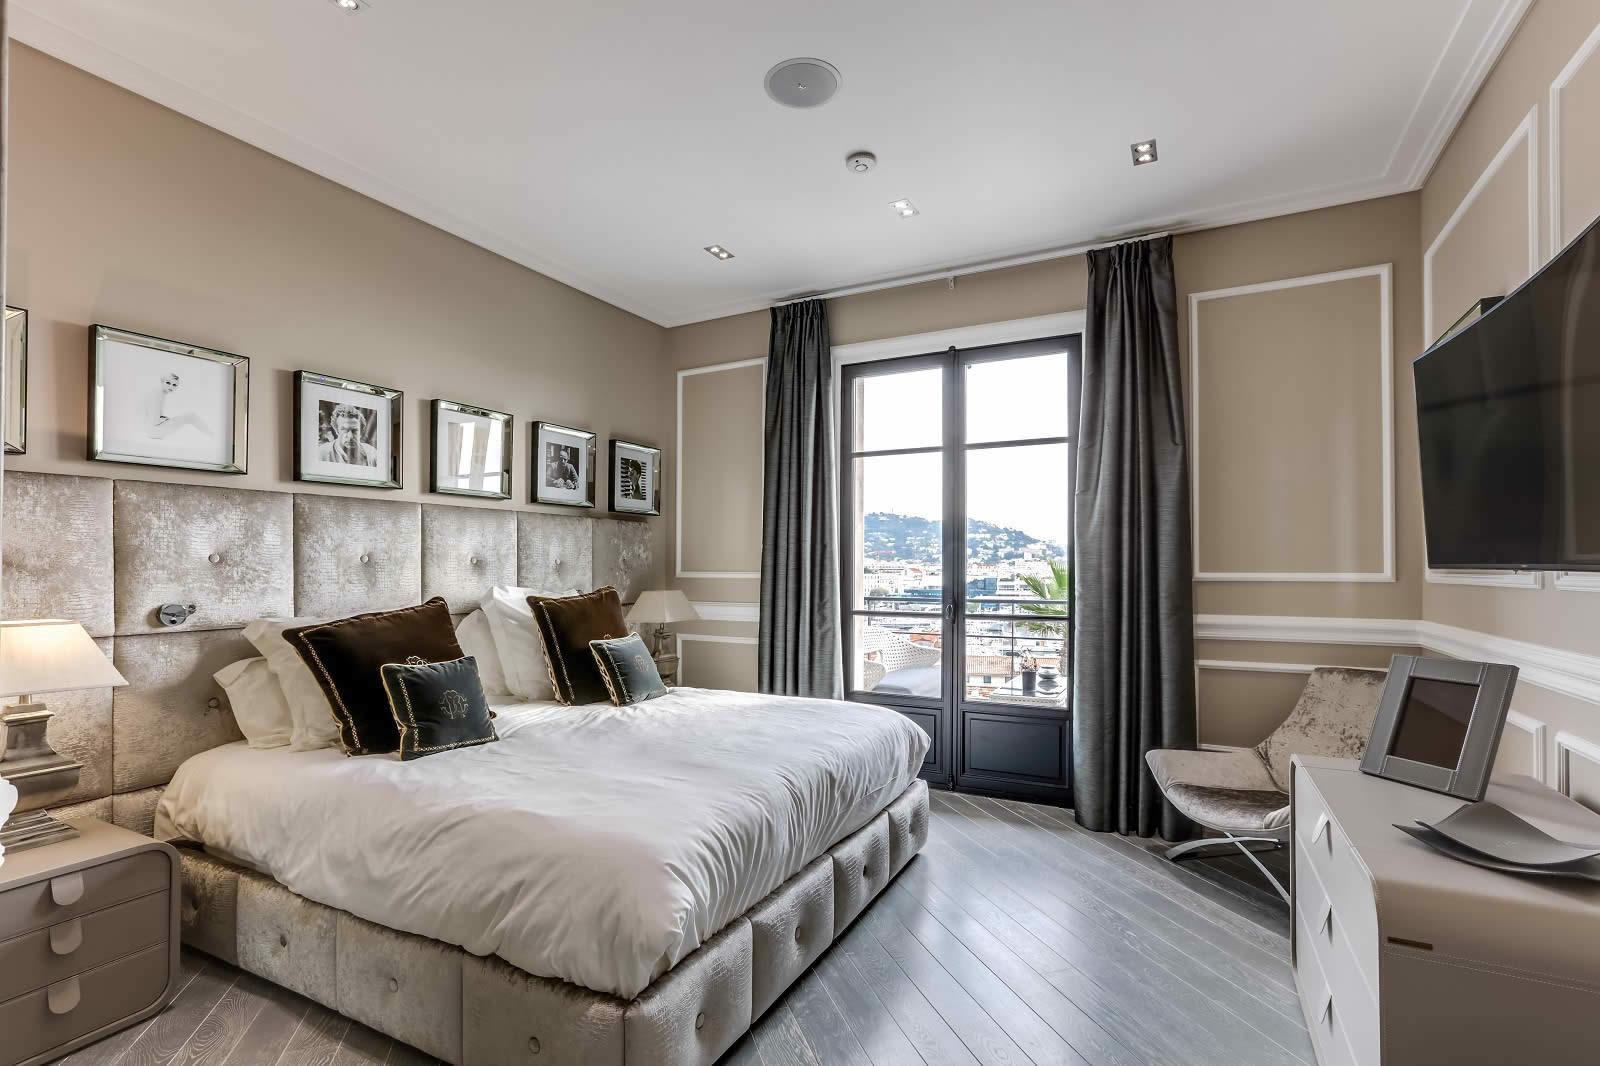 villa-standing-a-vendre-vue-panoramique-mer-7-chambres-piscine-chauffee